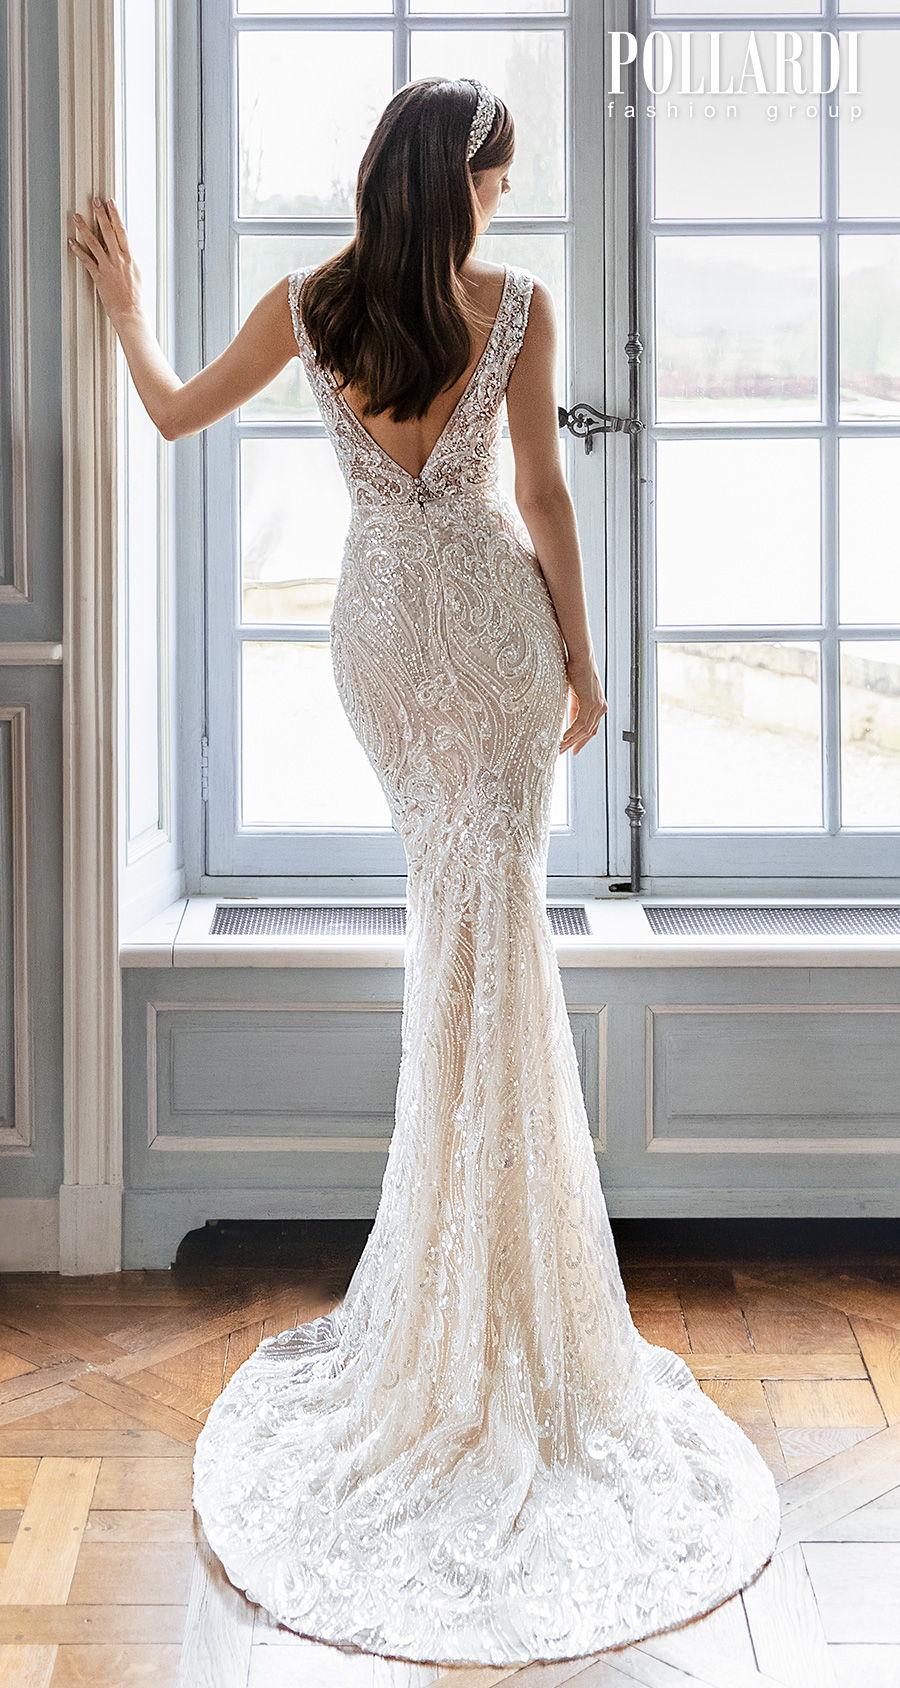 pollardi 2021 royalty bridal sleeveless deep plunging v neck full embellishment elegant glamorous sheath fit and flare wedding dress v back short train (jolie) bv